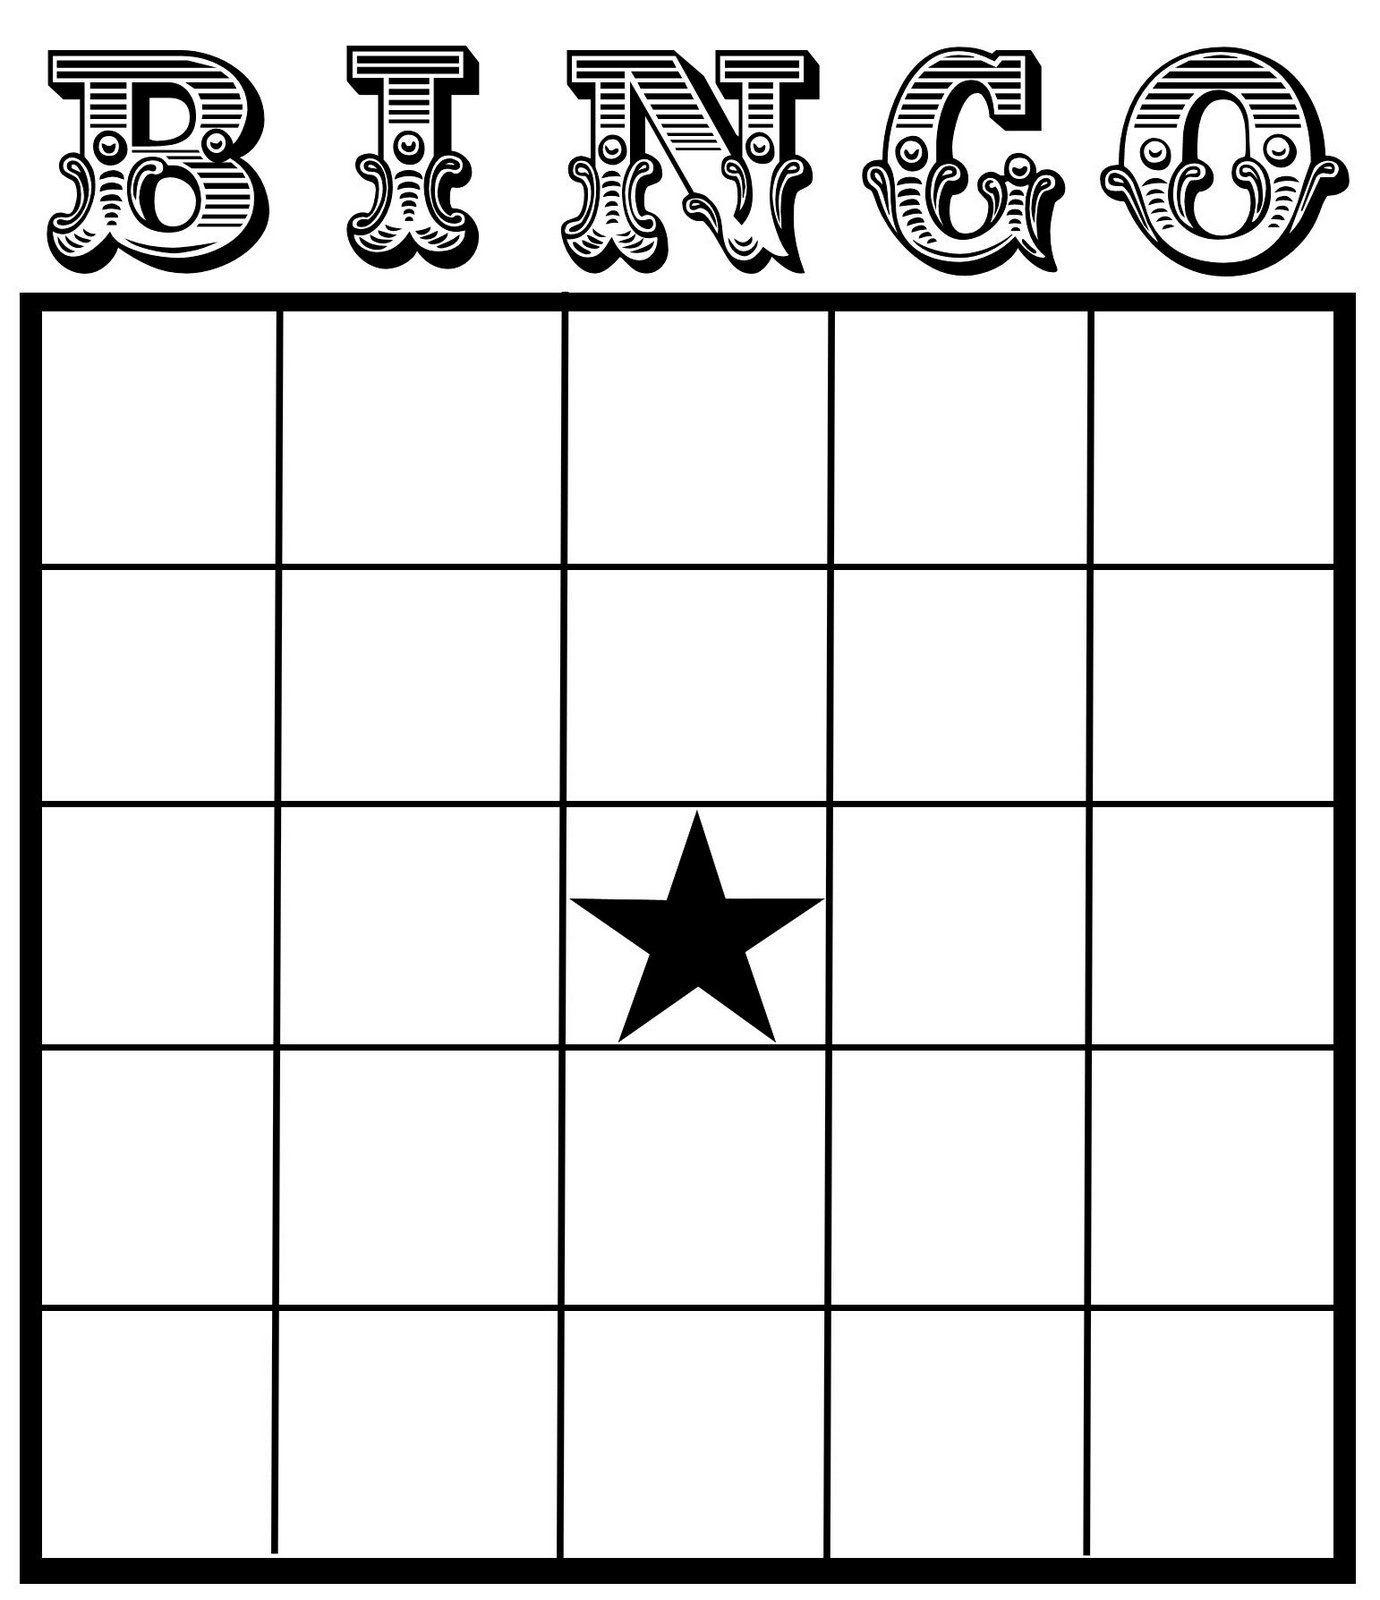 Christine Zani: Bingo Card Printables To Share | Reading & Writing - Free Printable Bingo Games